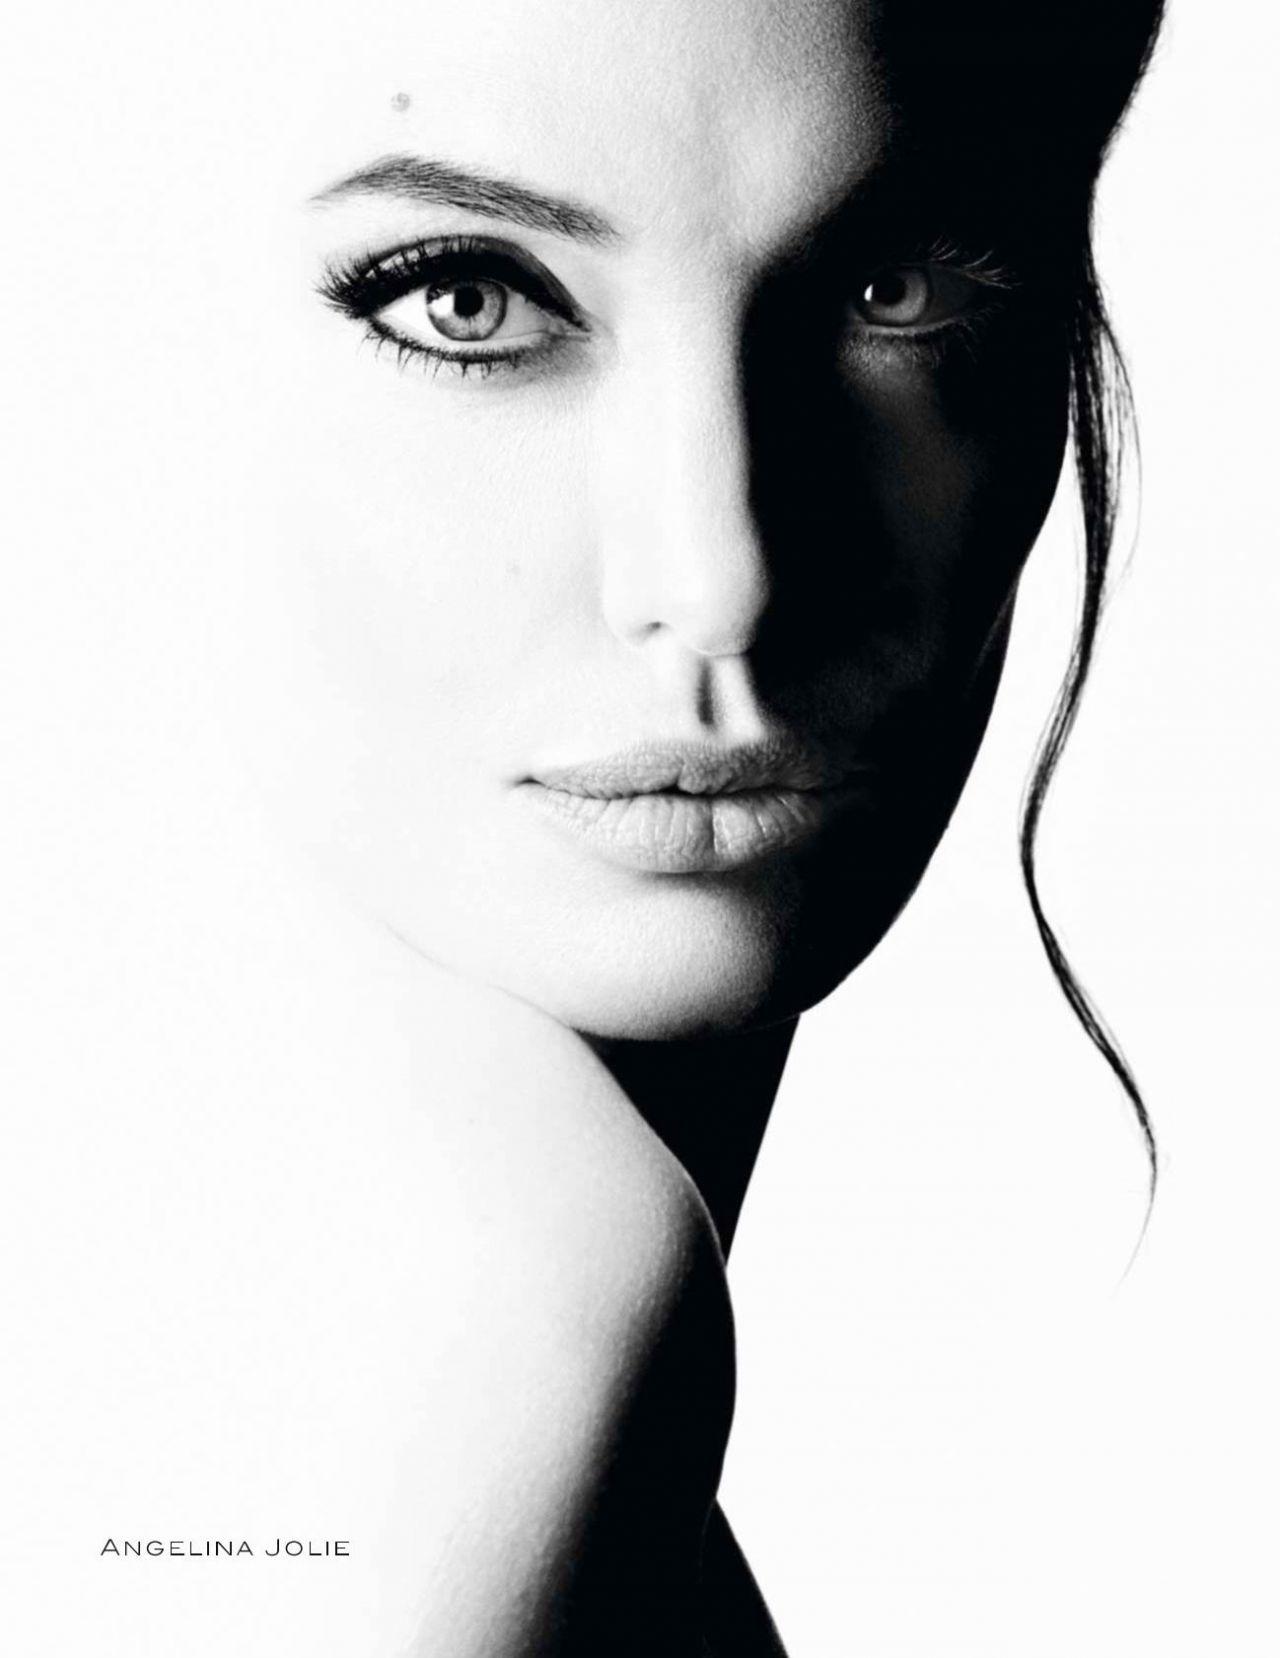 Anastasia Zadorozhnaya broke up with her producer 08/31/2009